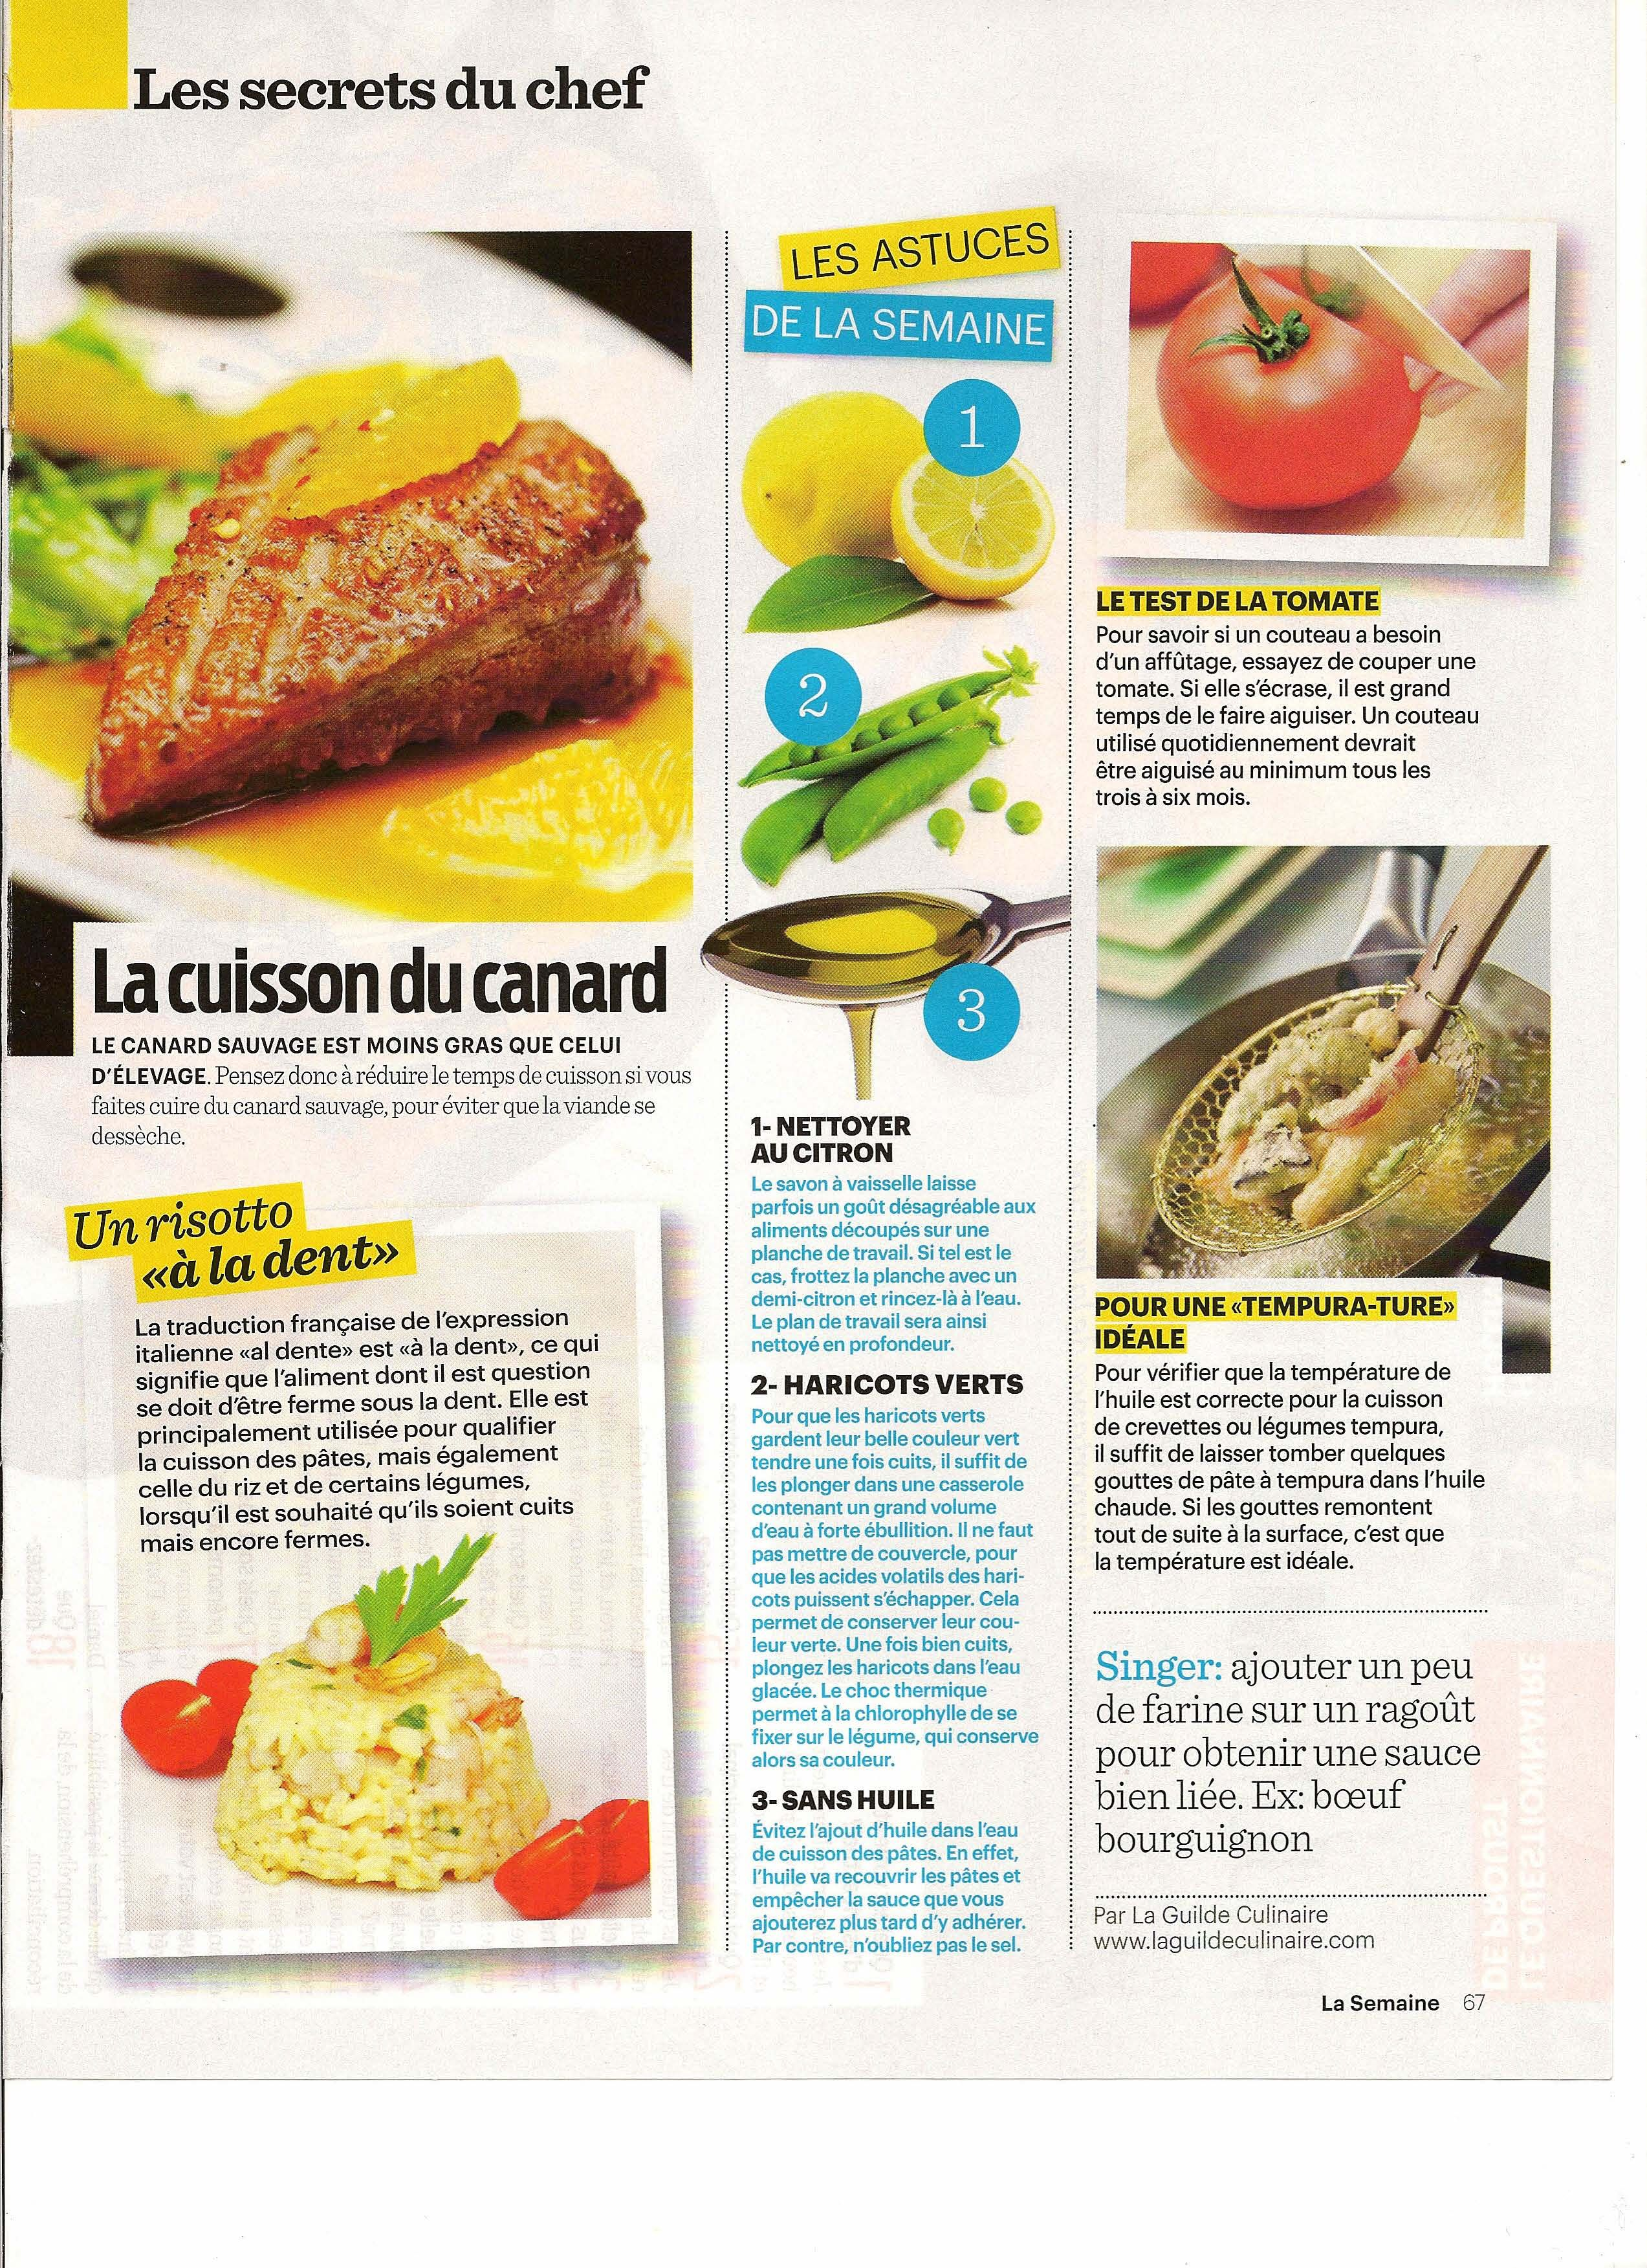 Alimentation:  Les Secrets du Chef: La cuisson du canard - Frawsy